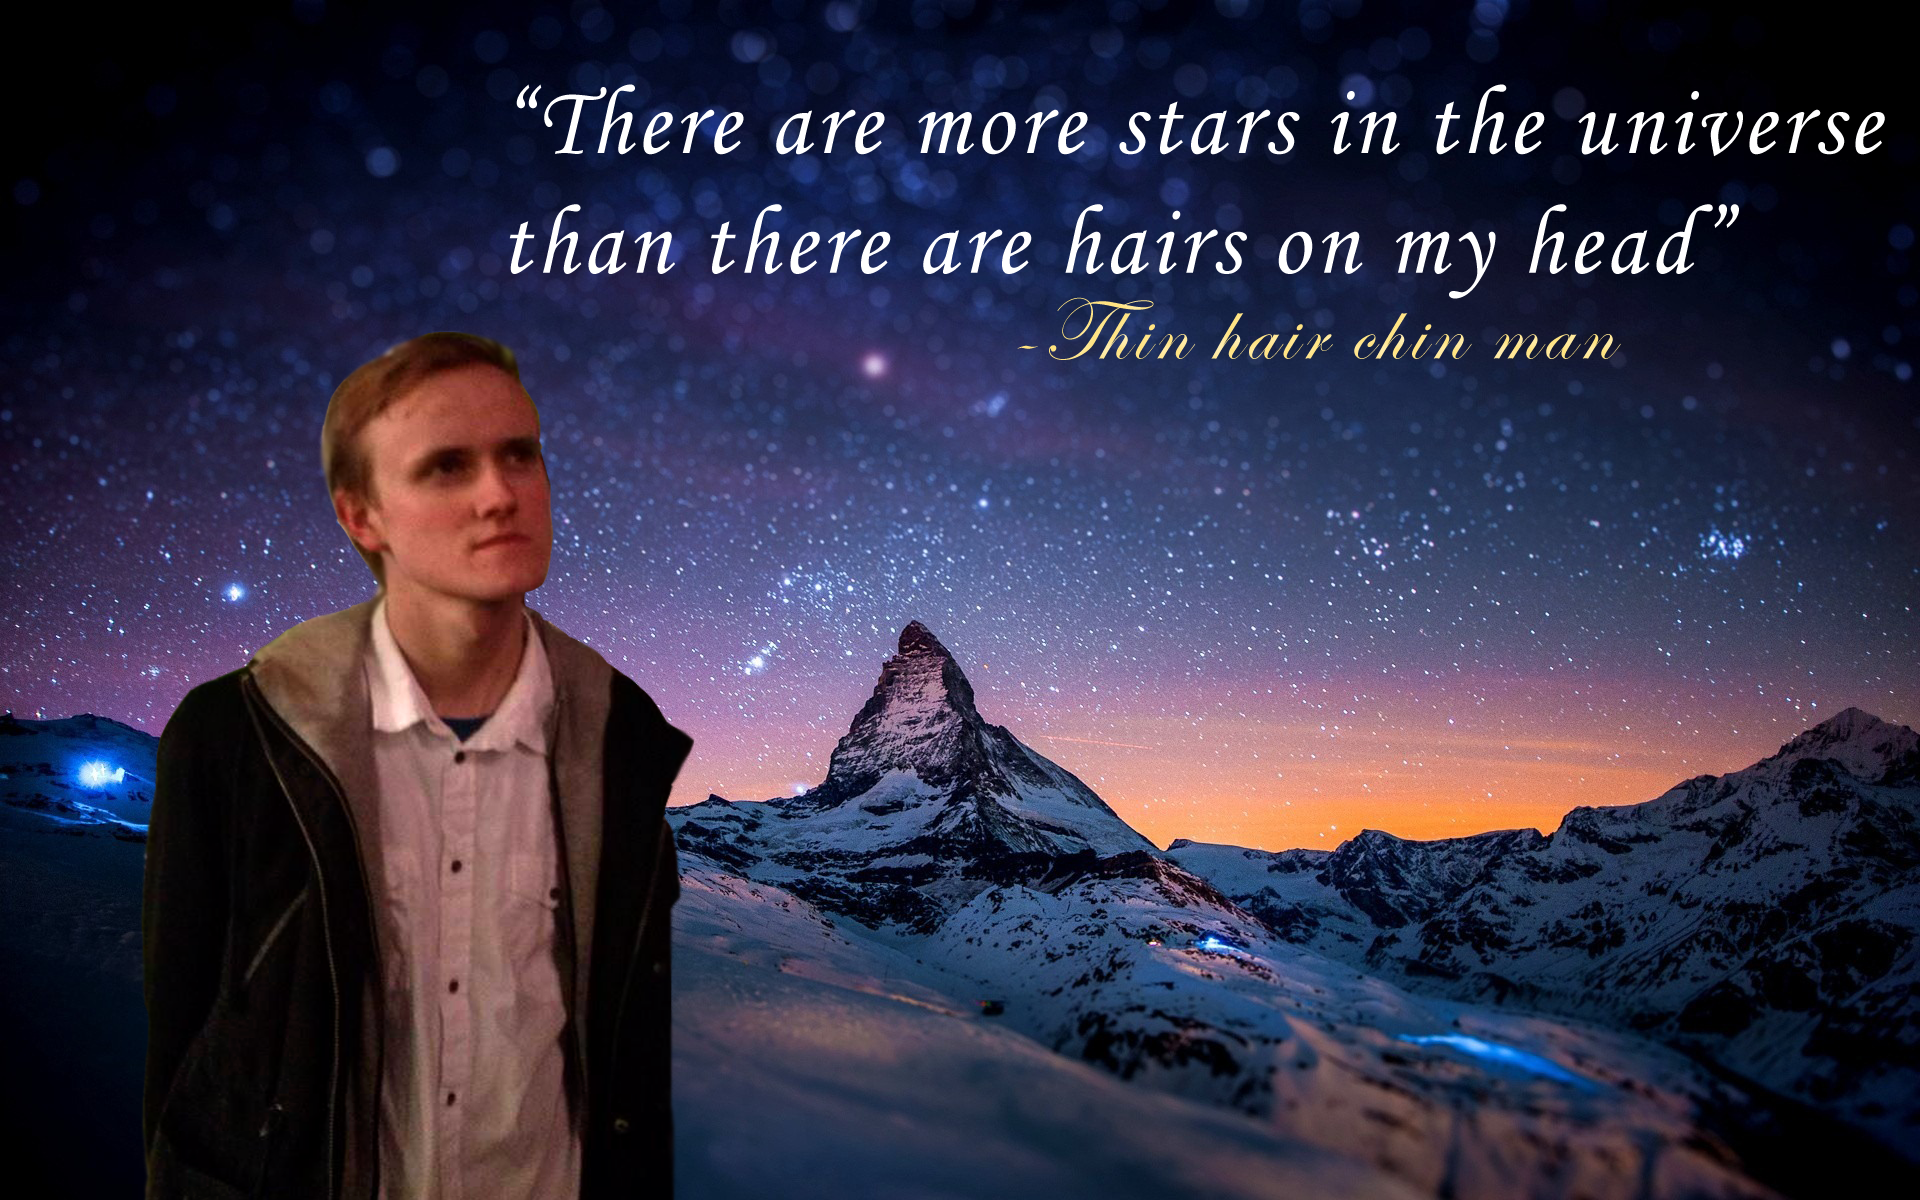 thin chin moment | thin hair chin man | know your meme